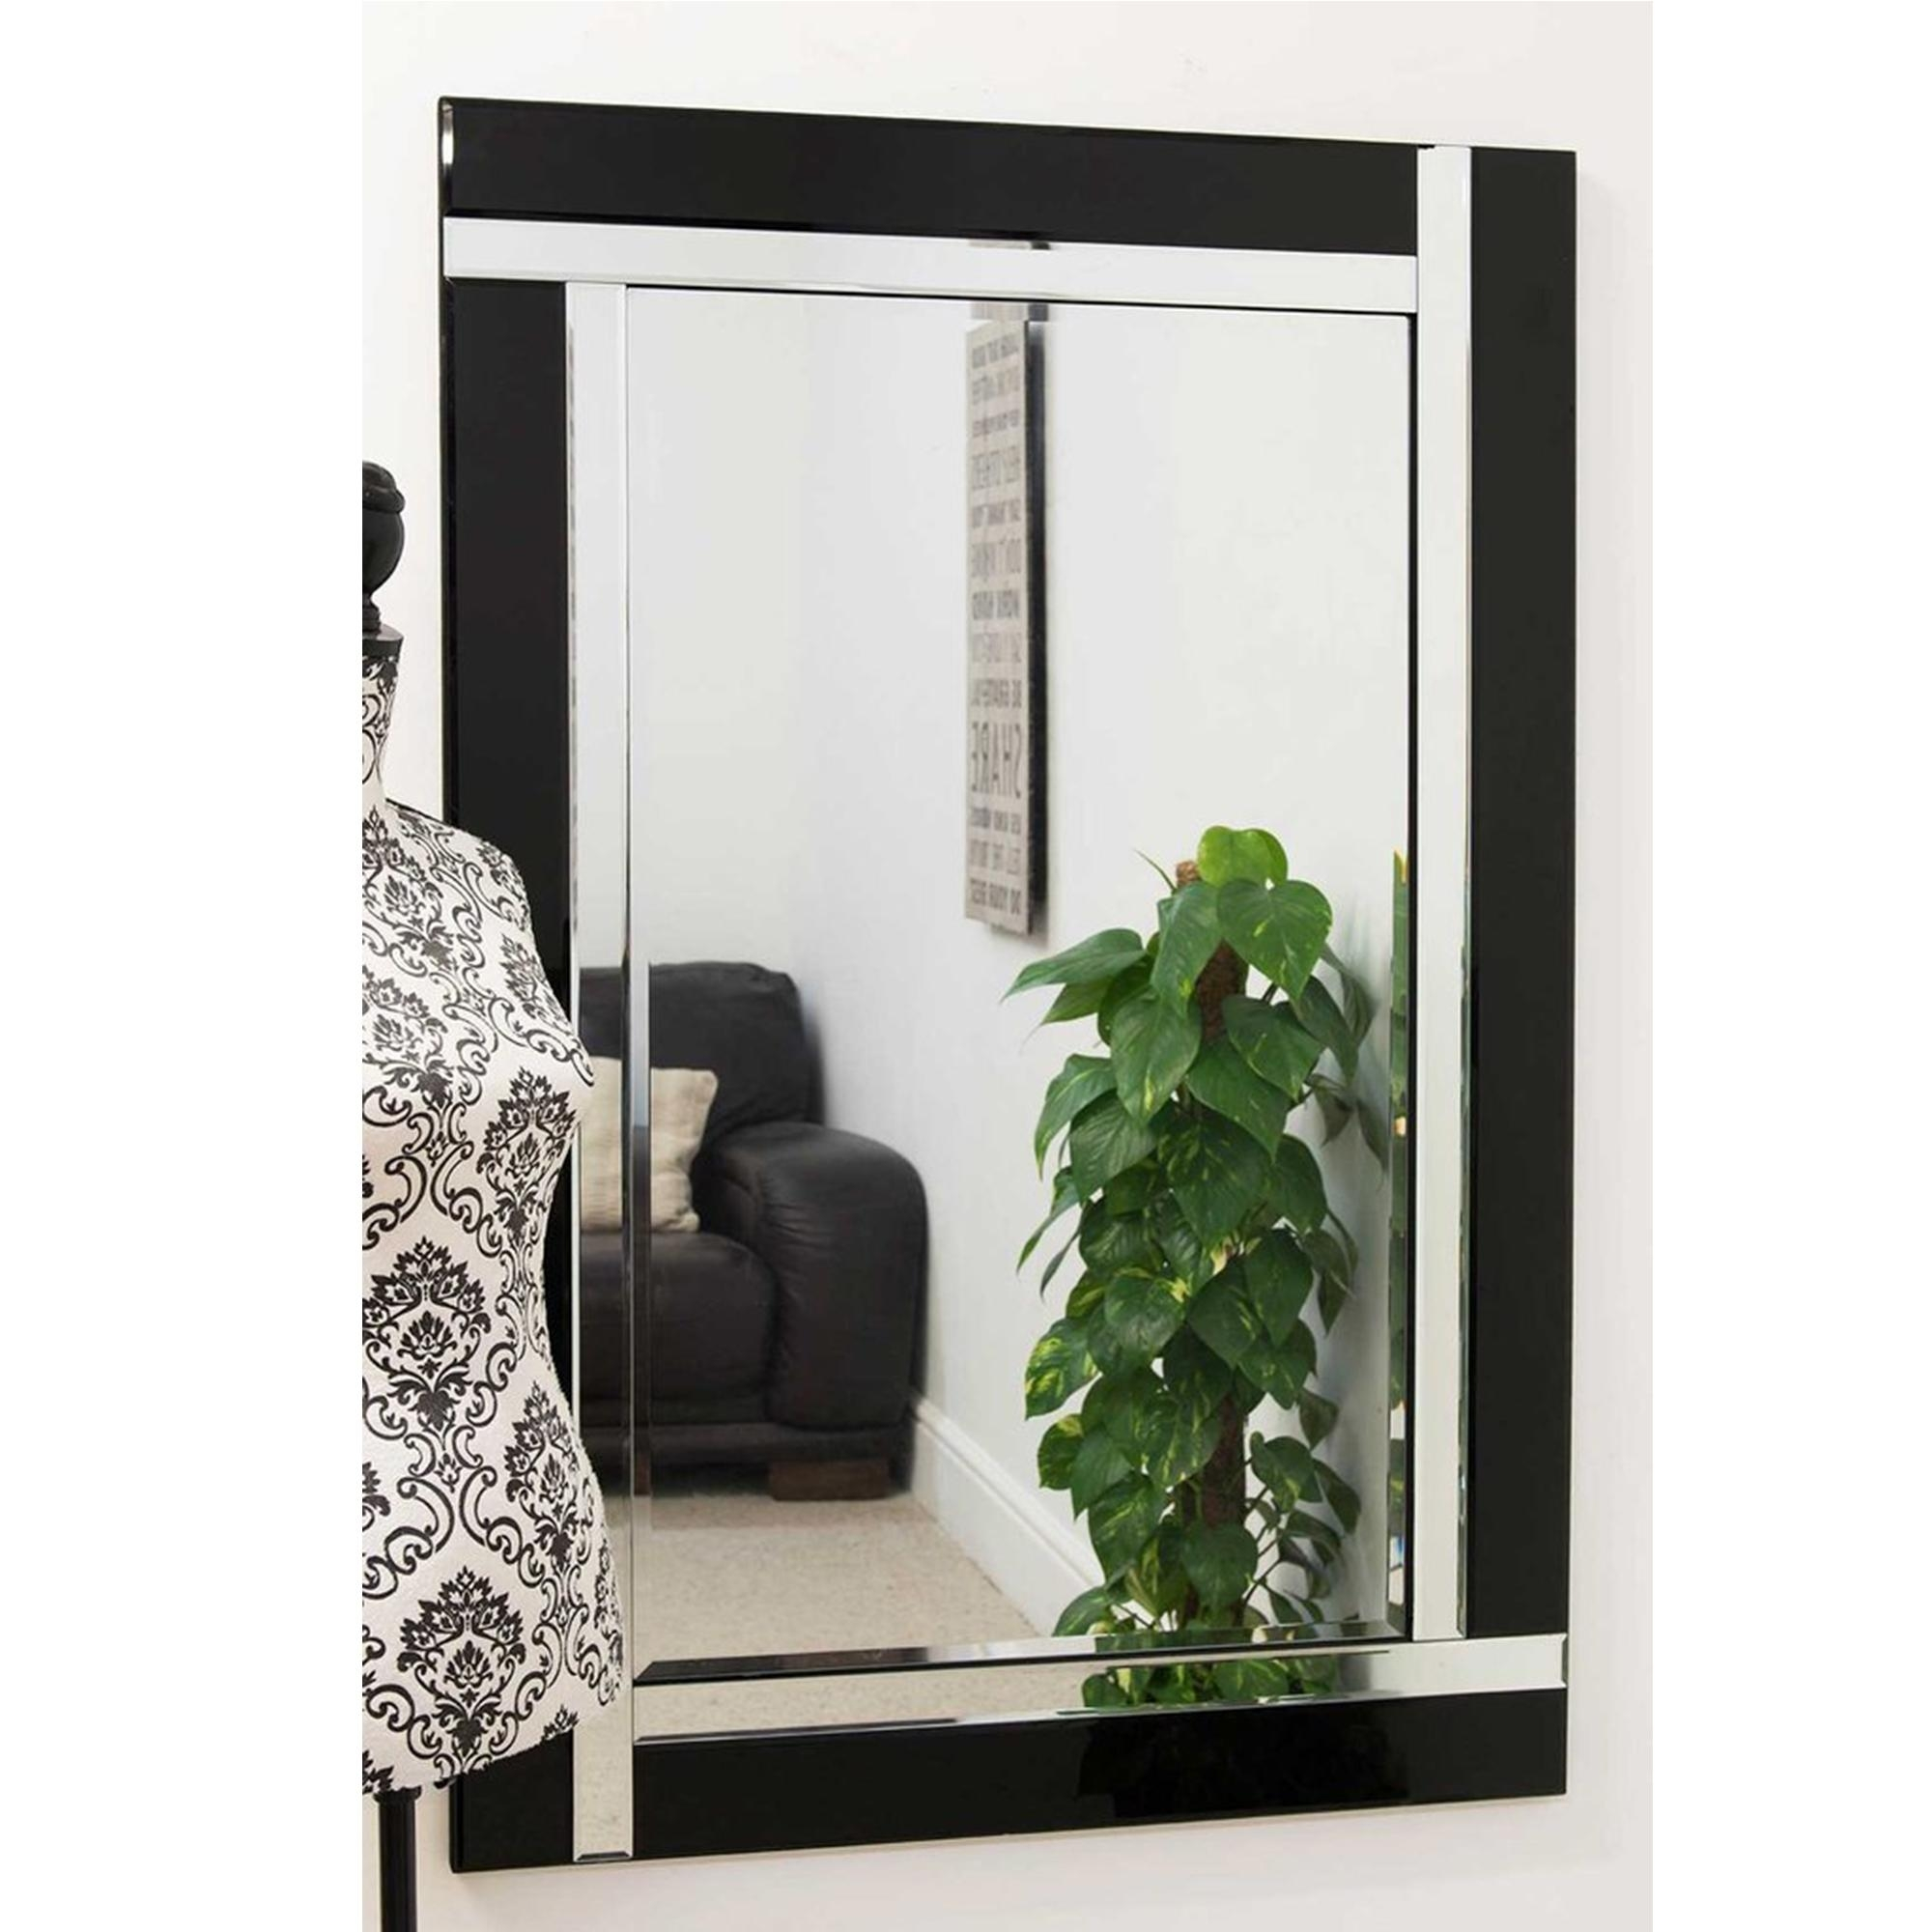 Large Contemporary Black Venetian Mirror | Decorative Venetian Mirrors Regarding Large Venetian Mirrors (Image 9 of 20)